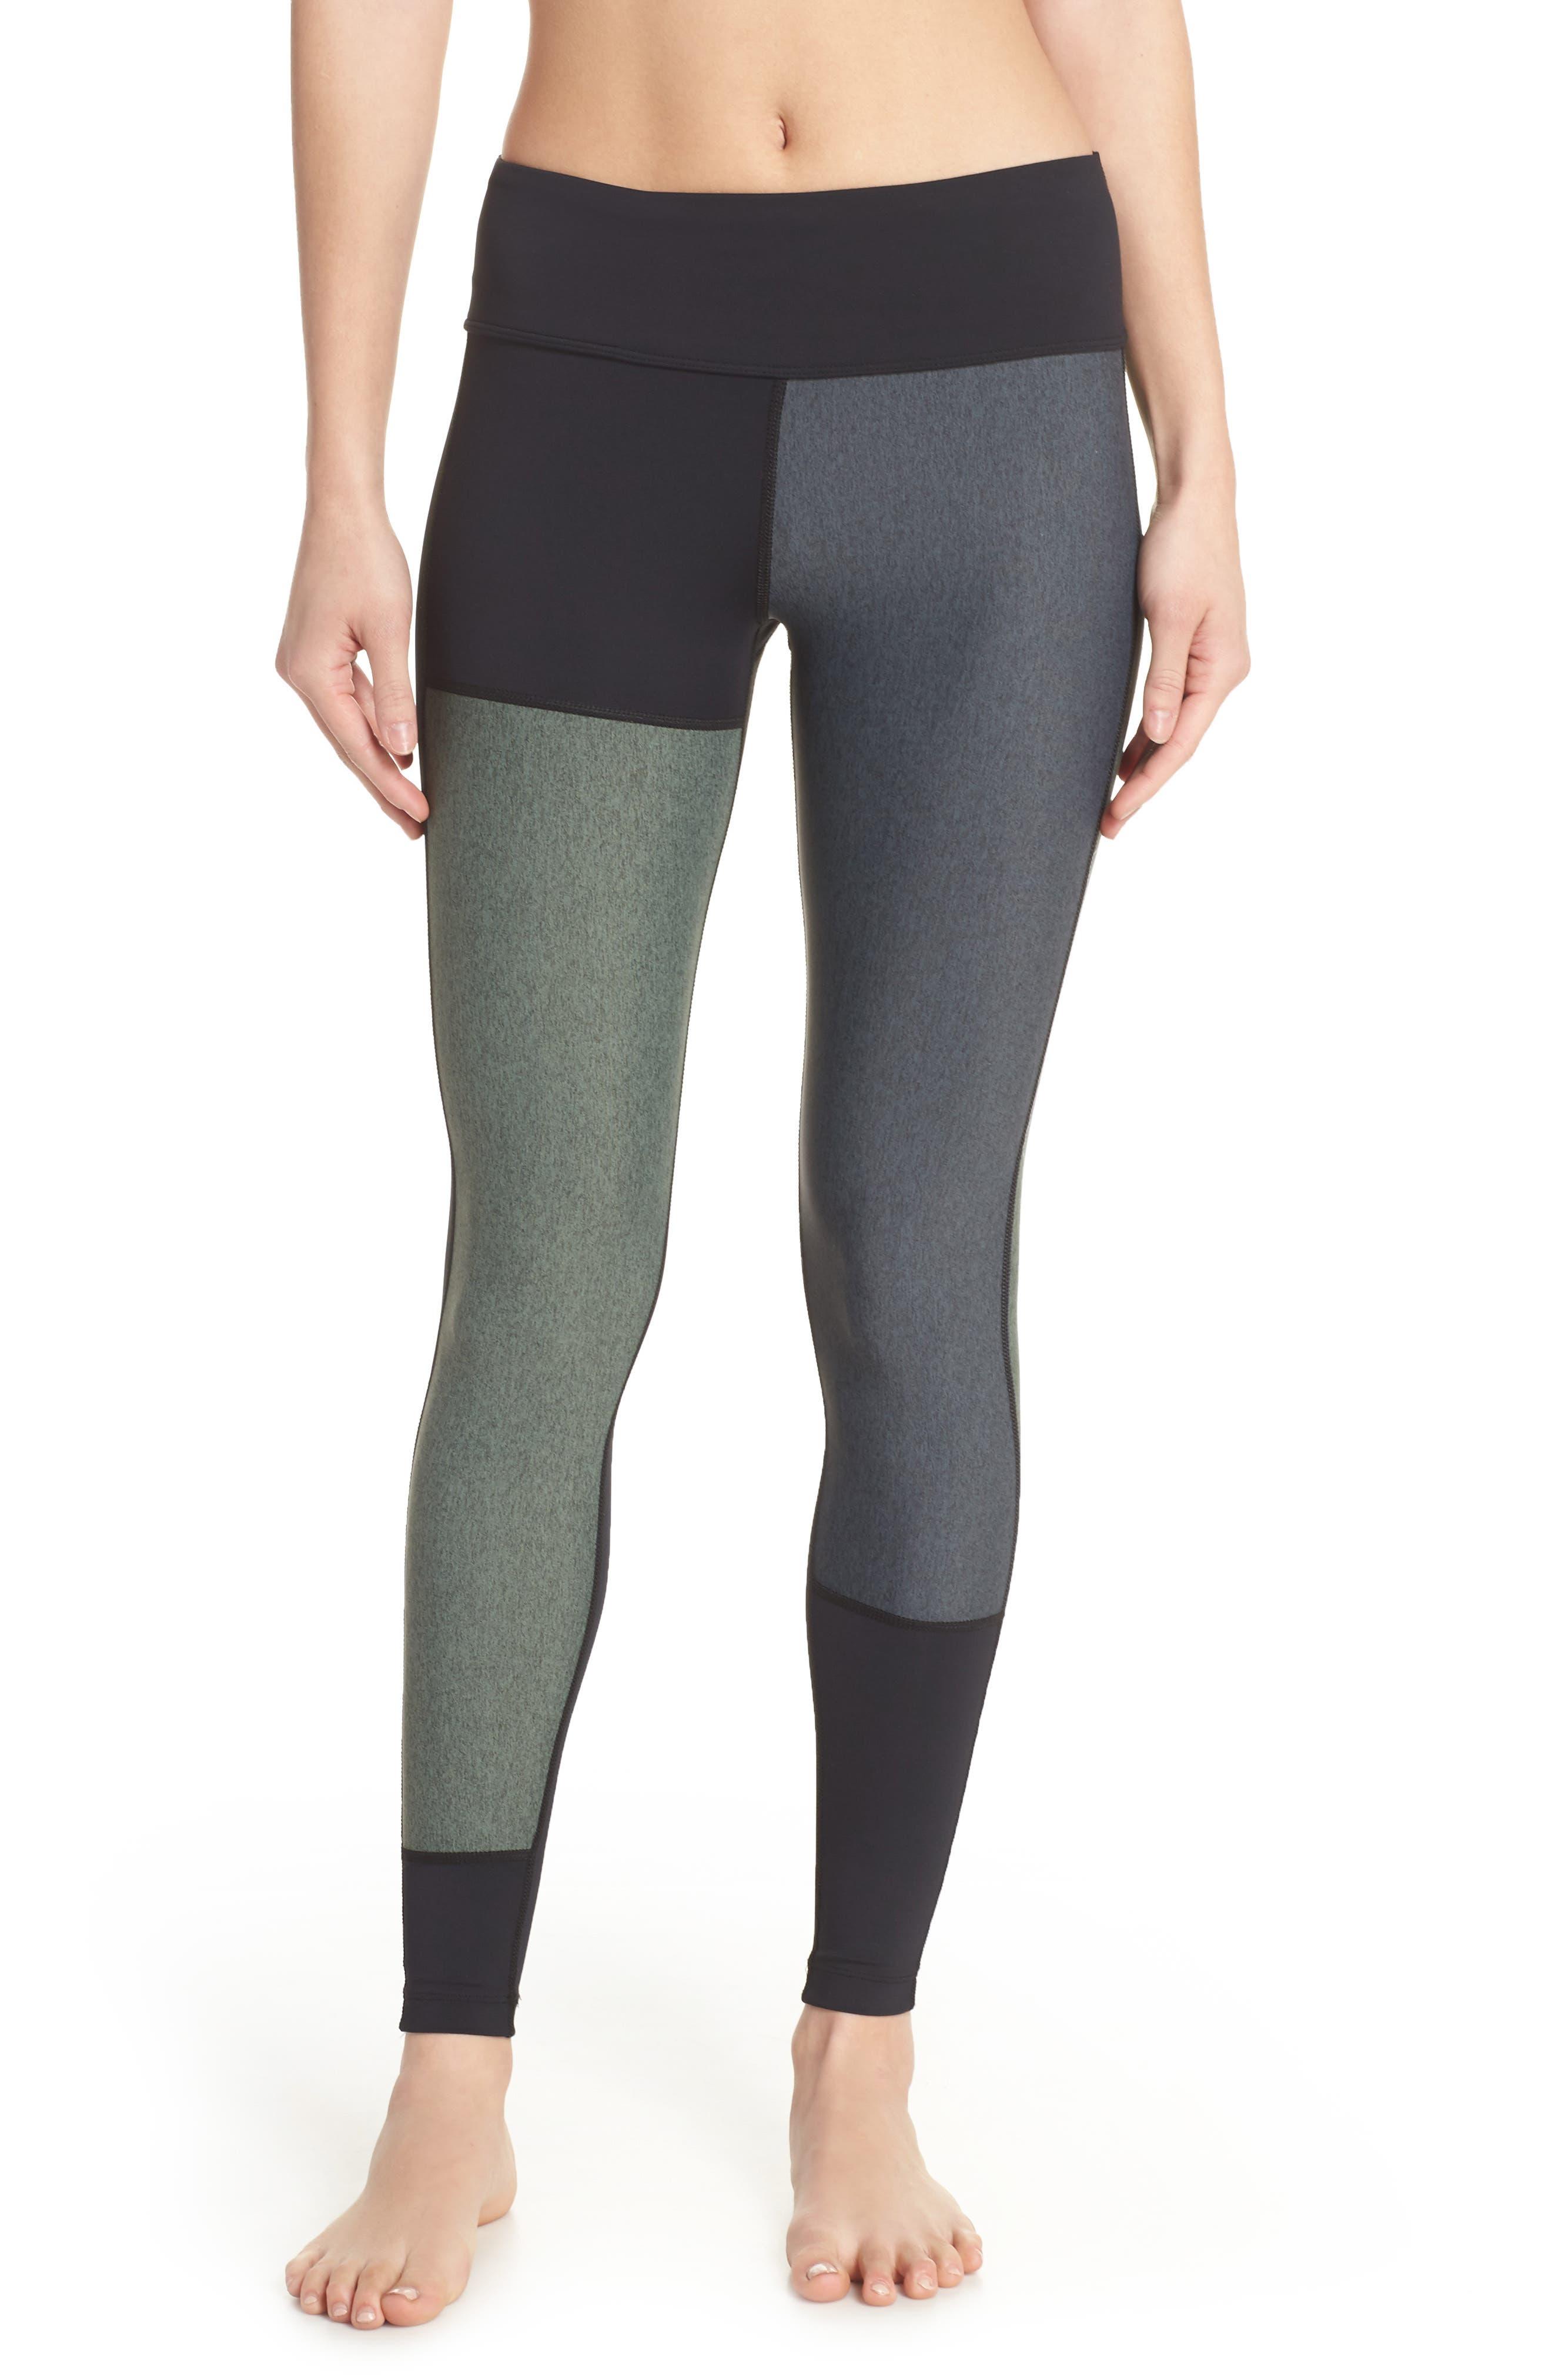 Patchwork Leggings,                         Main,                         color, Black/ Moss/ Heather